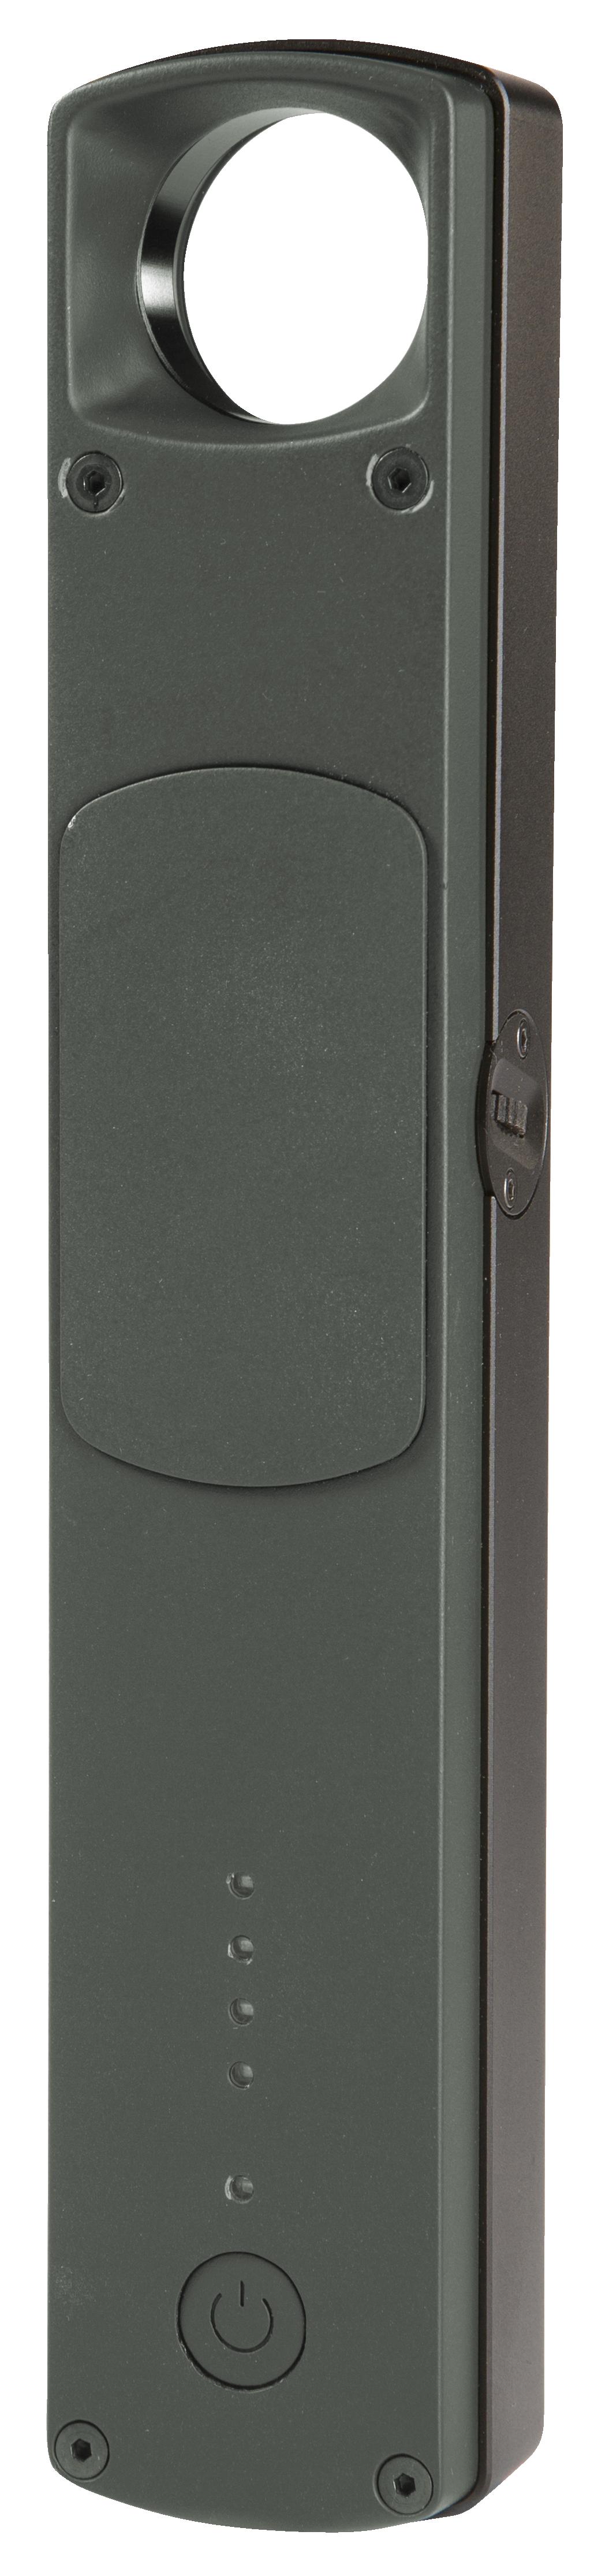 S150II AA بطارية جيب شق مصباح   6X إجمالي زيادة   شهادة CE 1 تباع   جديد